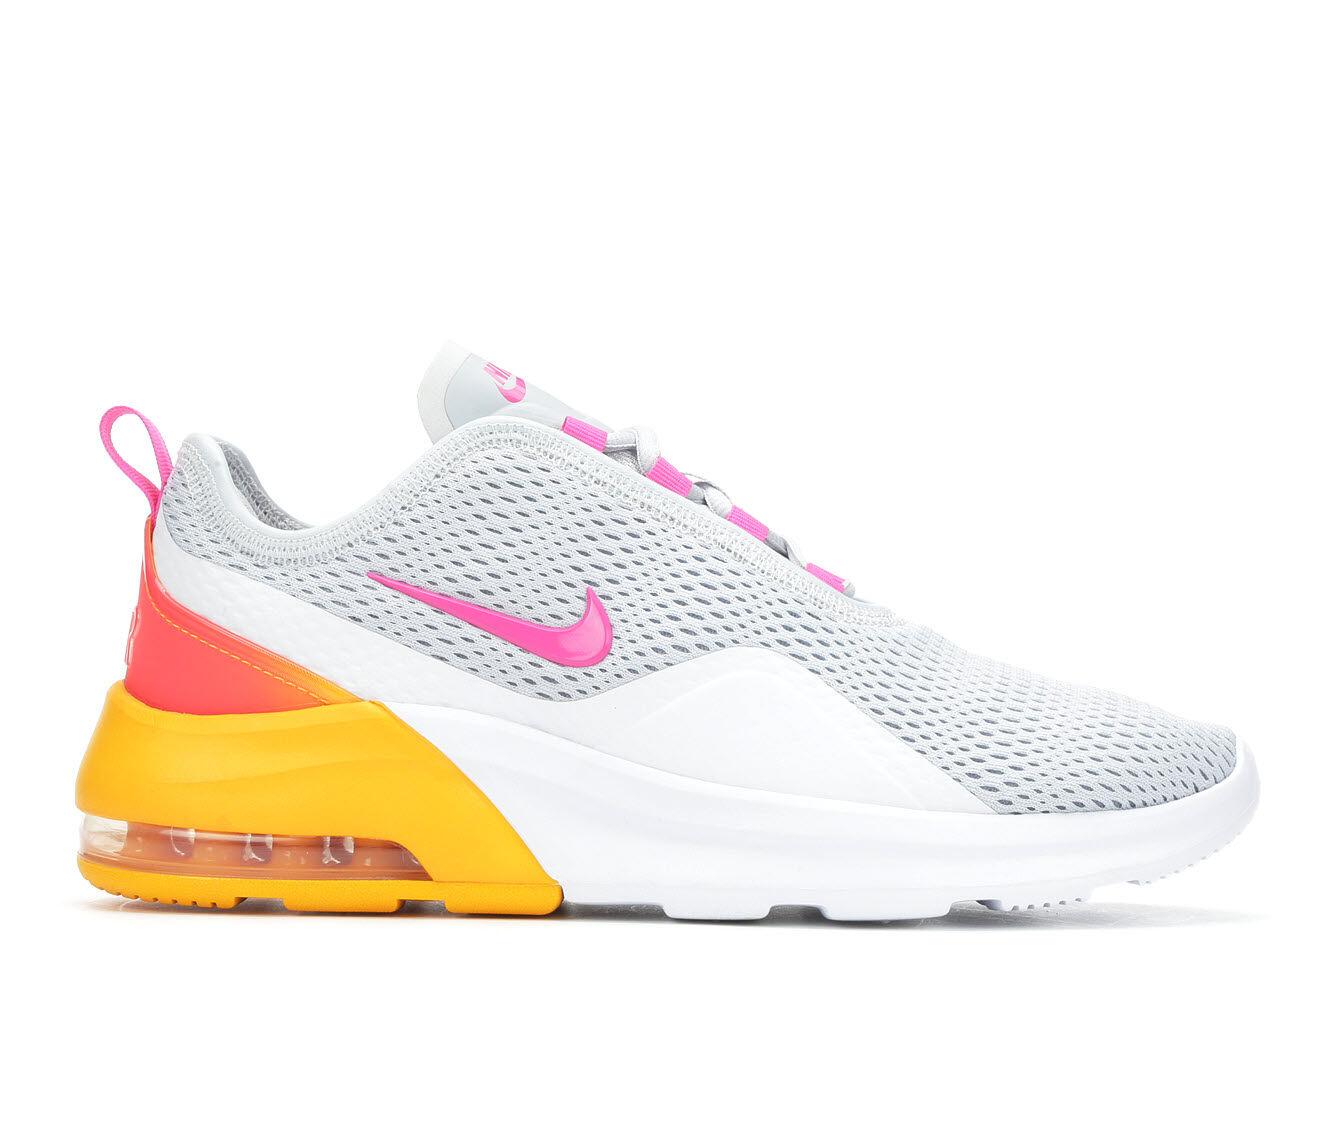 uk shoes_kd4350